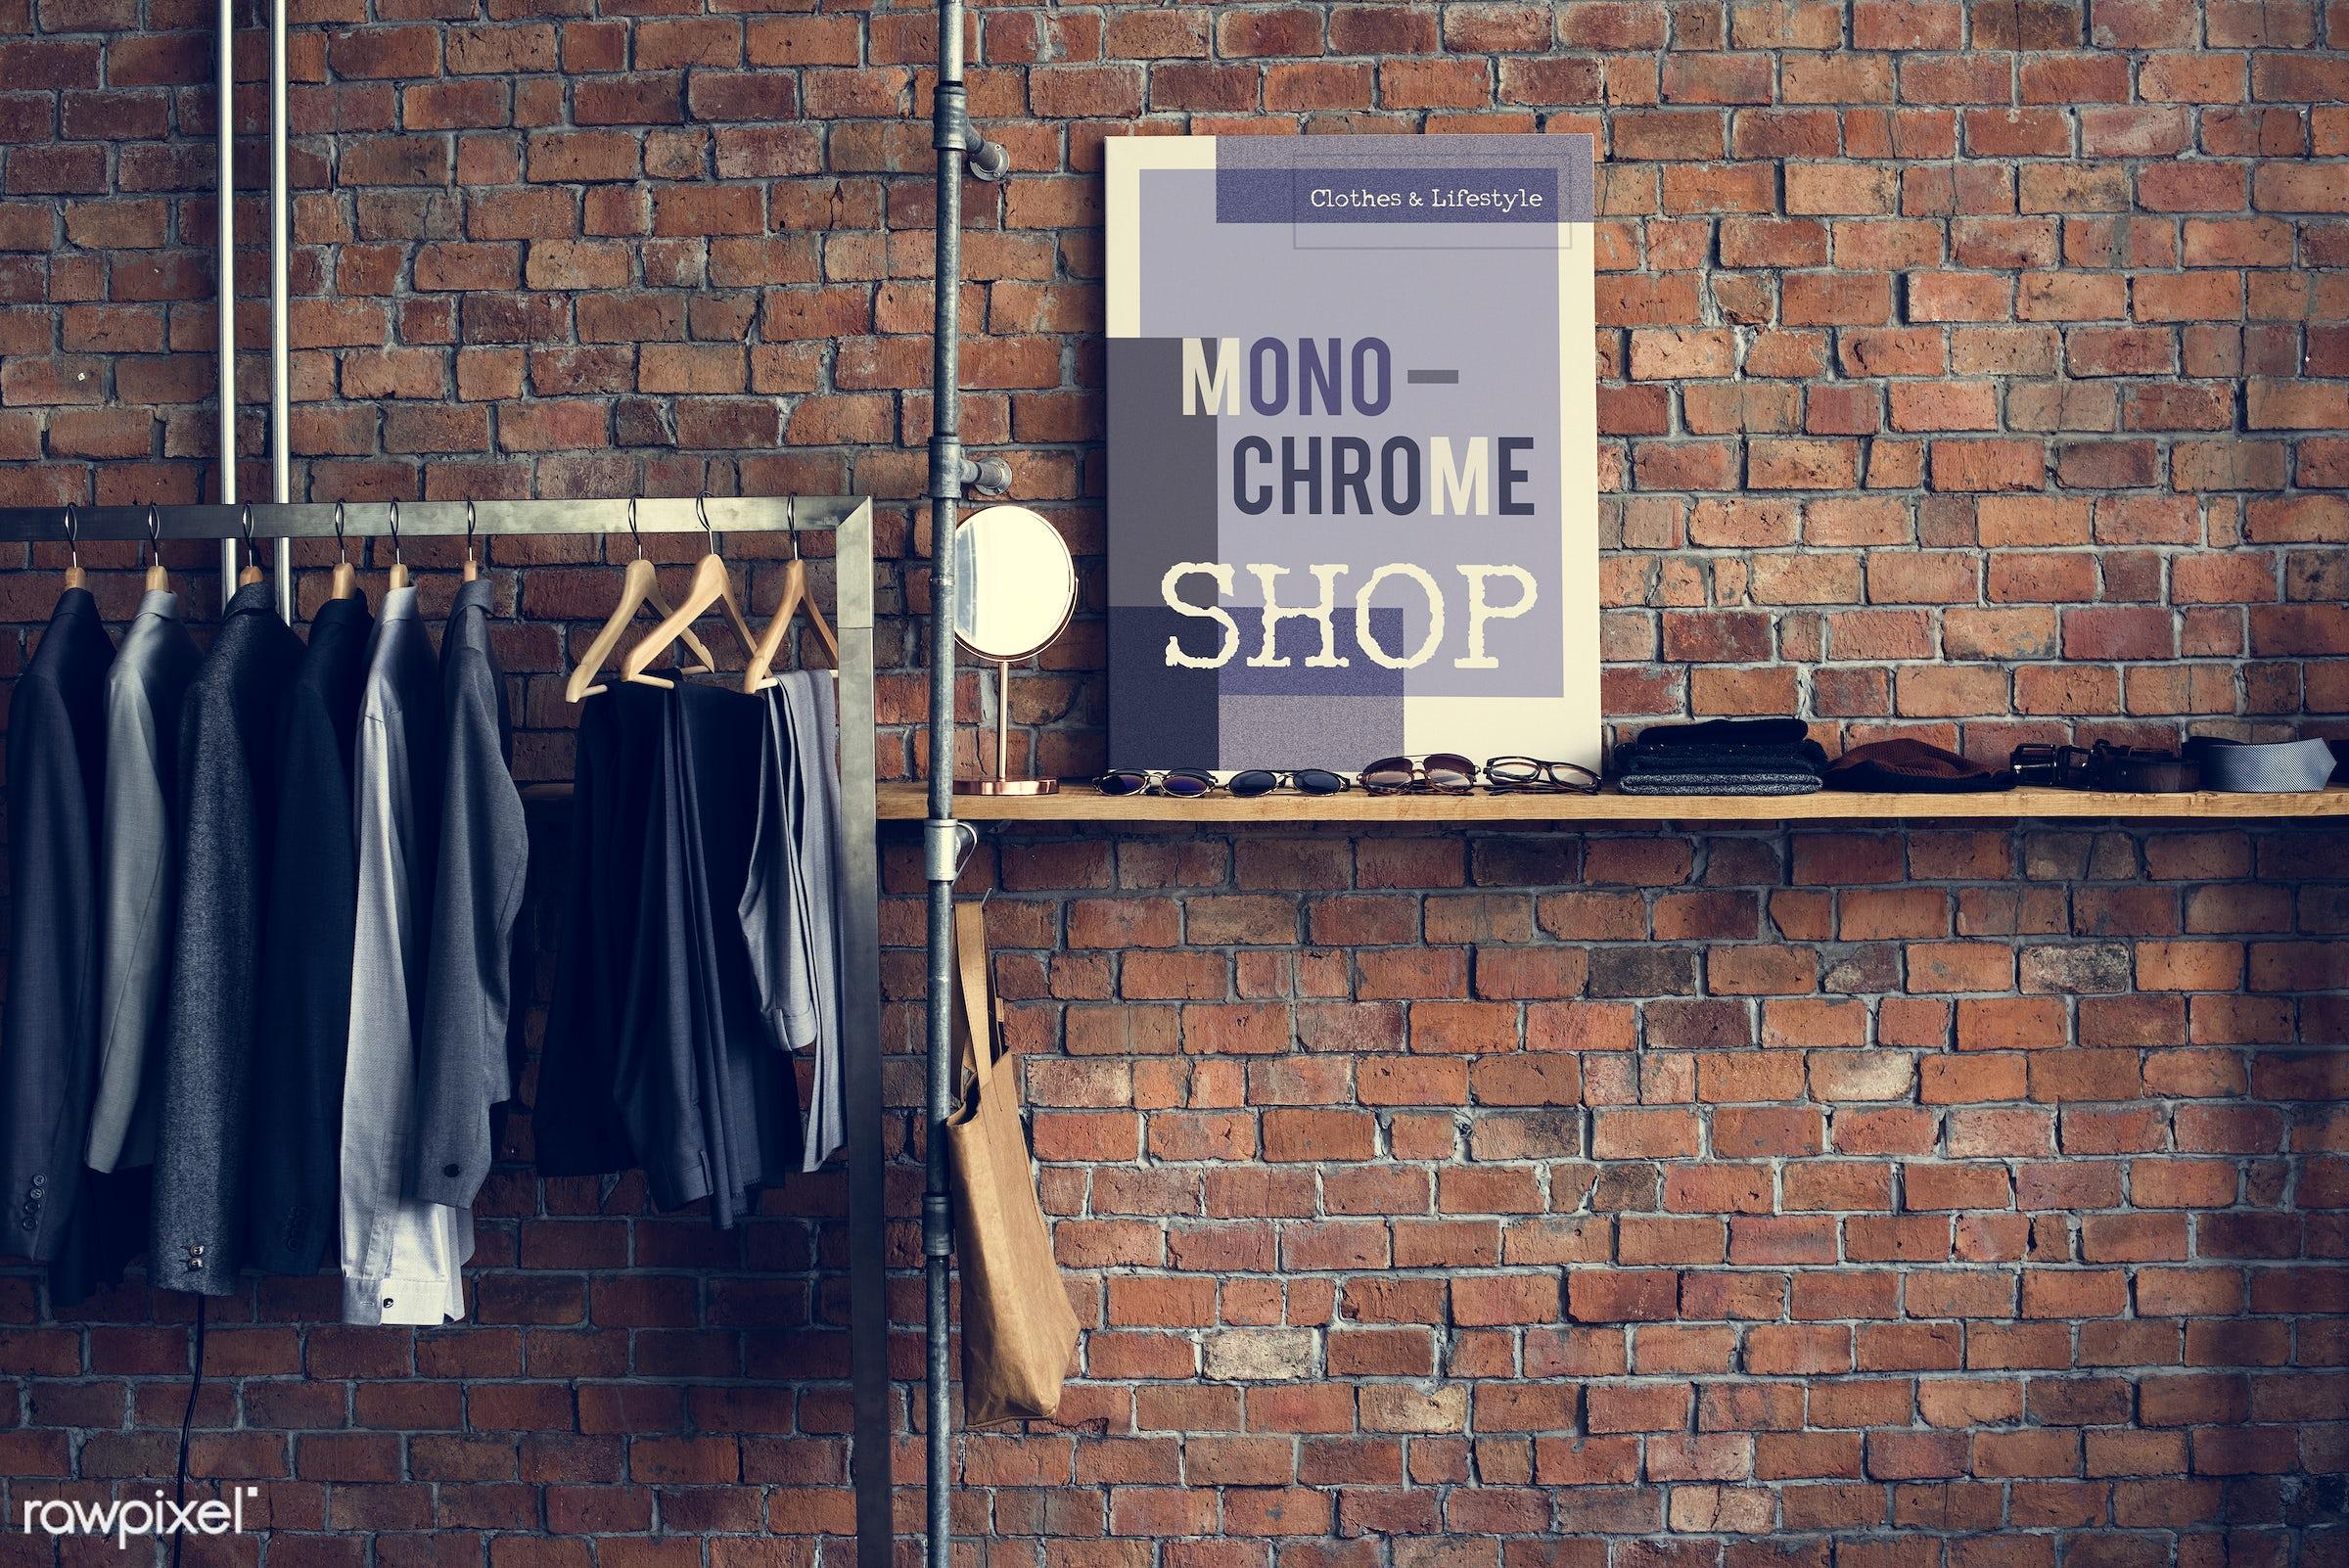 studio, coat hook, fashion, store, clothing, handicraft, garment, outfit, dressmaker, closet, stylist, collection, rack,...